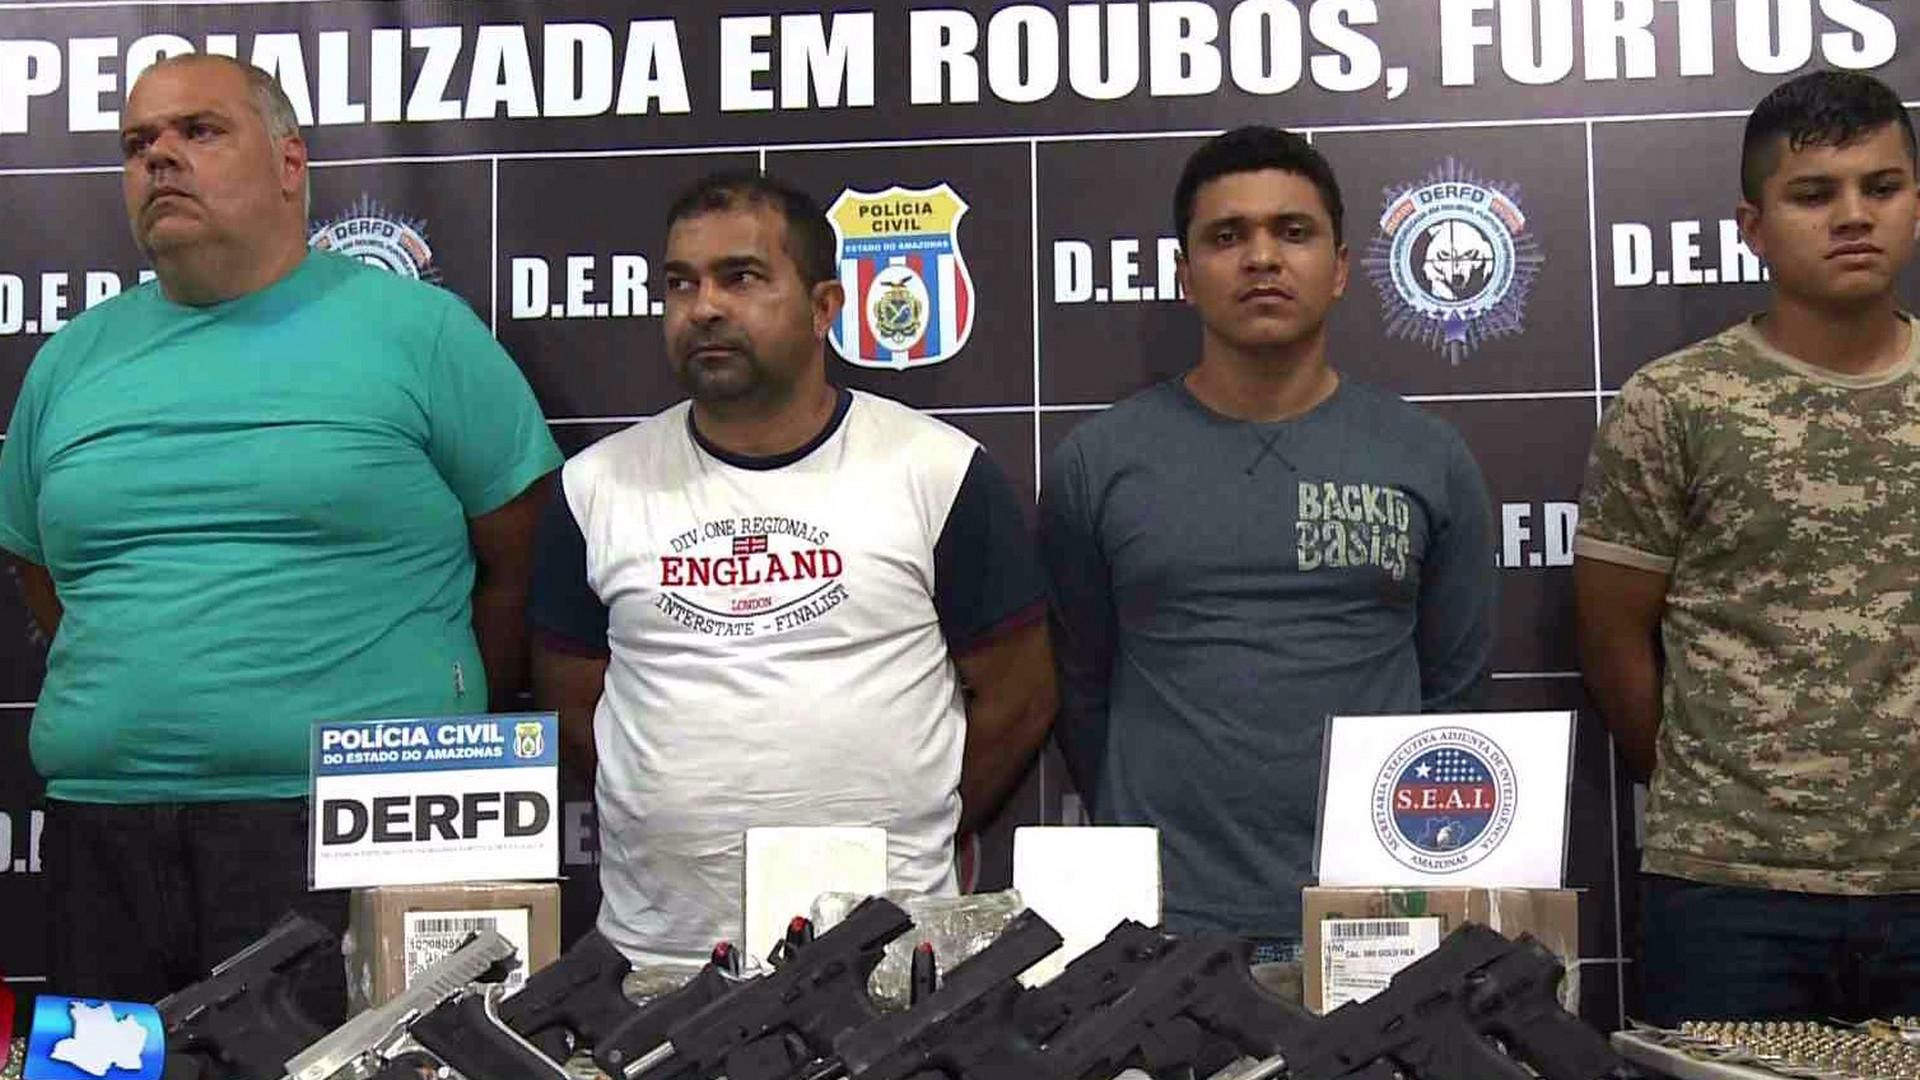 GERENTE DE LOJA É SUSPEITO DE PLANEJAR FURTO NO ESTABELECIMENTO - Alô Amazonas - 18/10/17